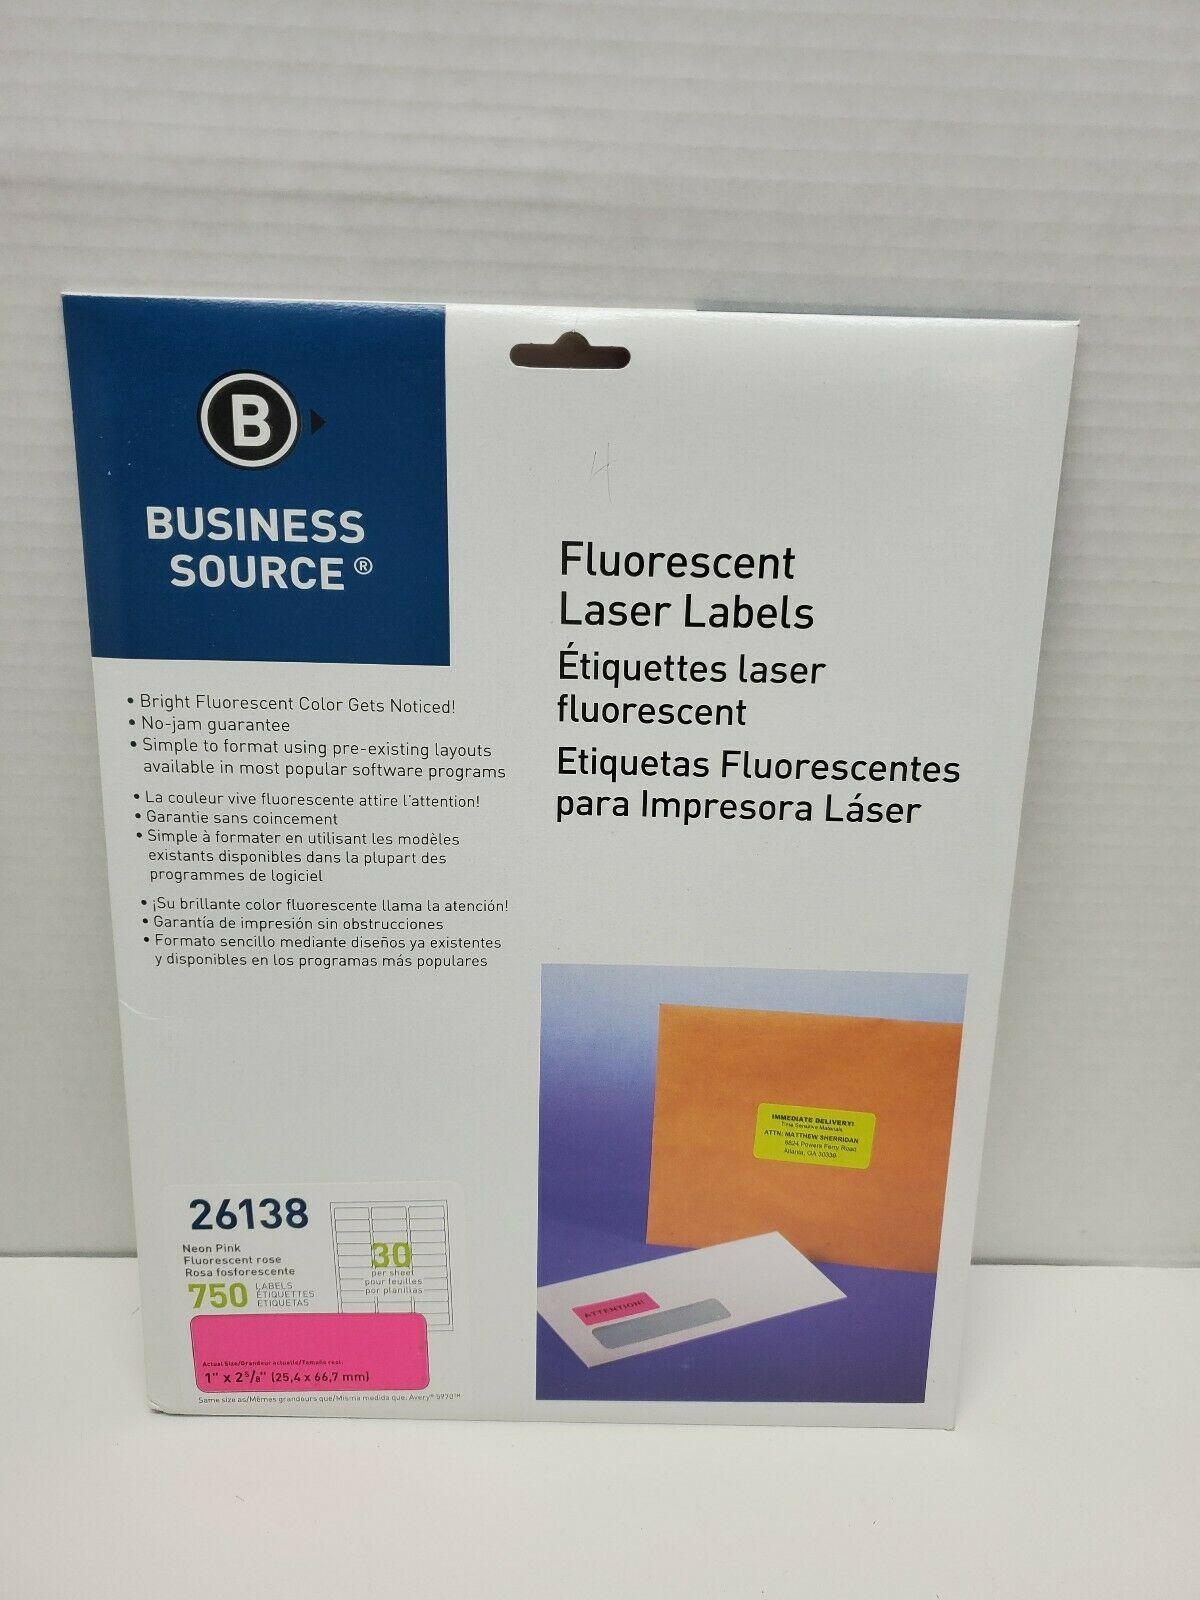 Business Source 2 Fluorescent Color Laser Labels